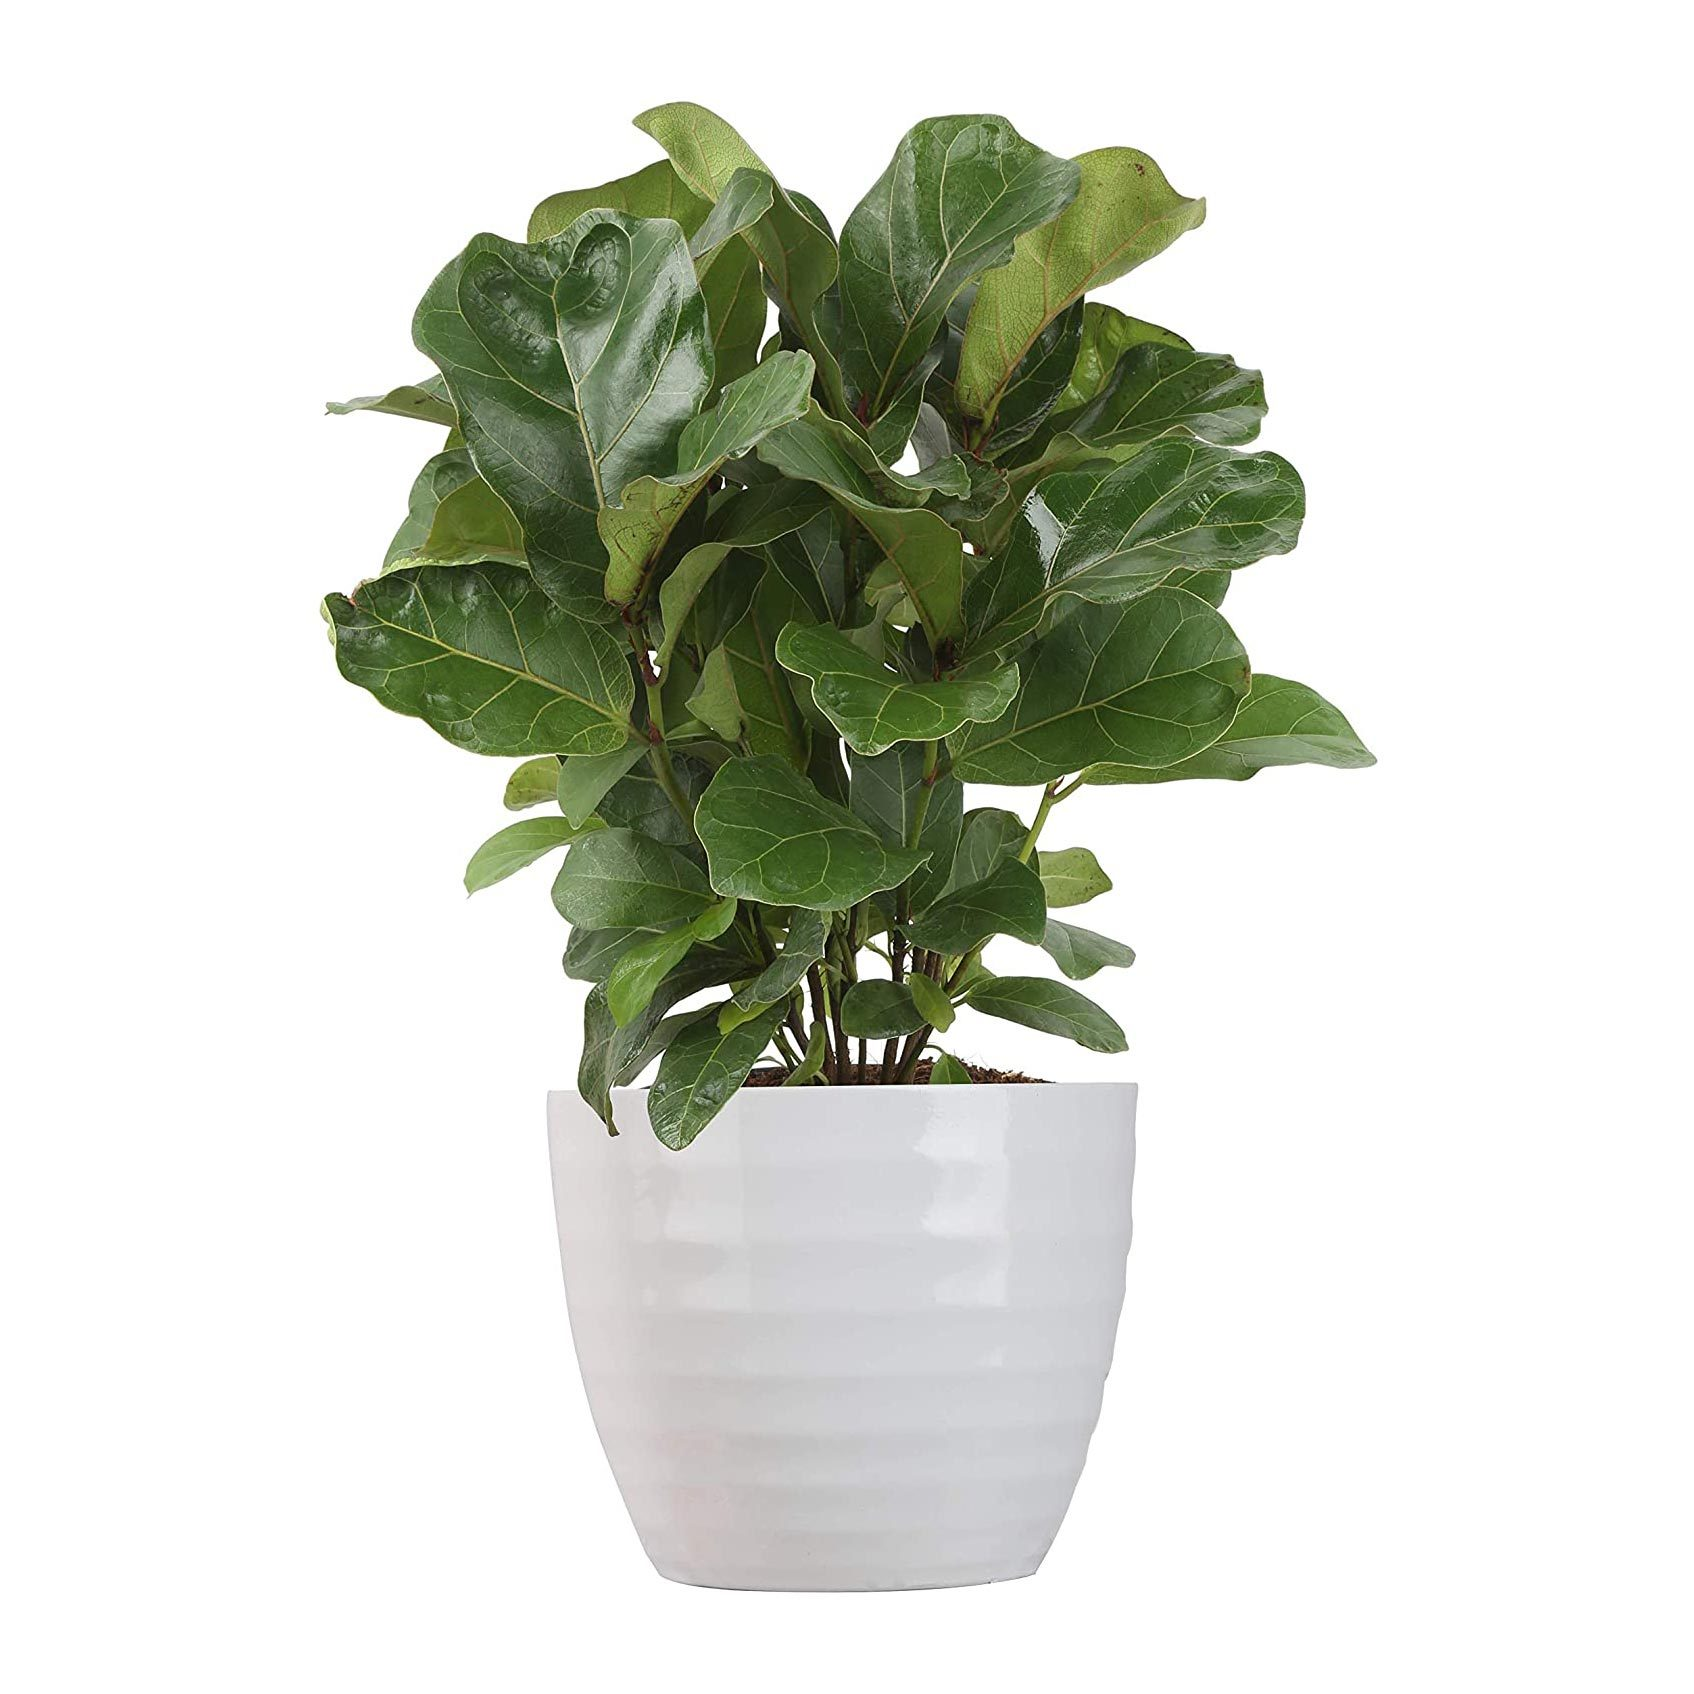 Costa Farms Ficus Lyrata Live Plant